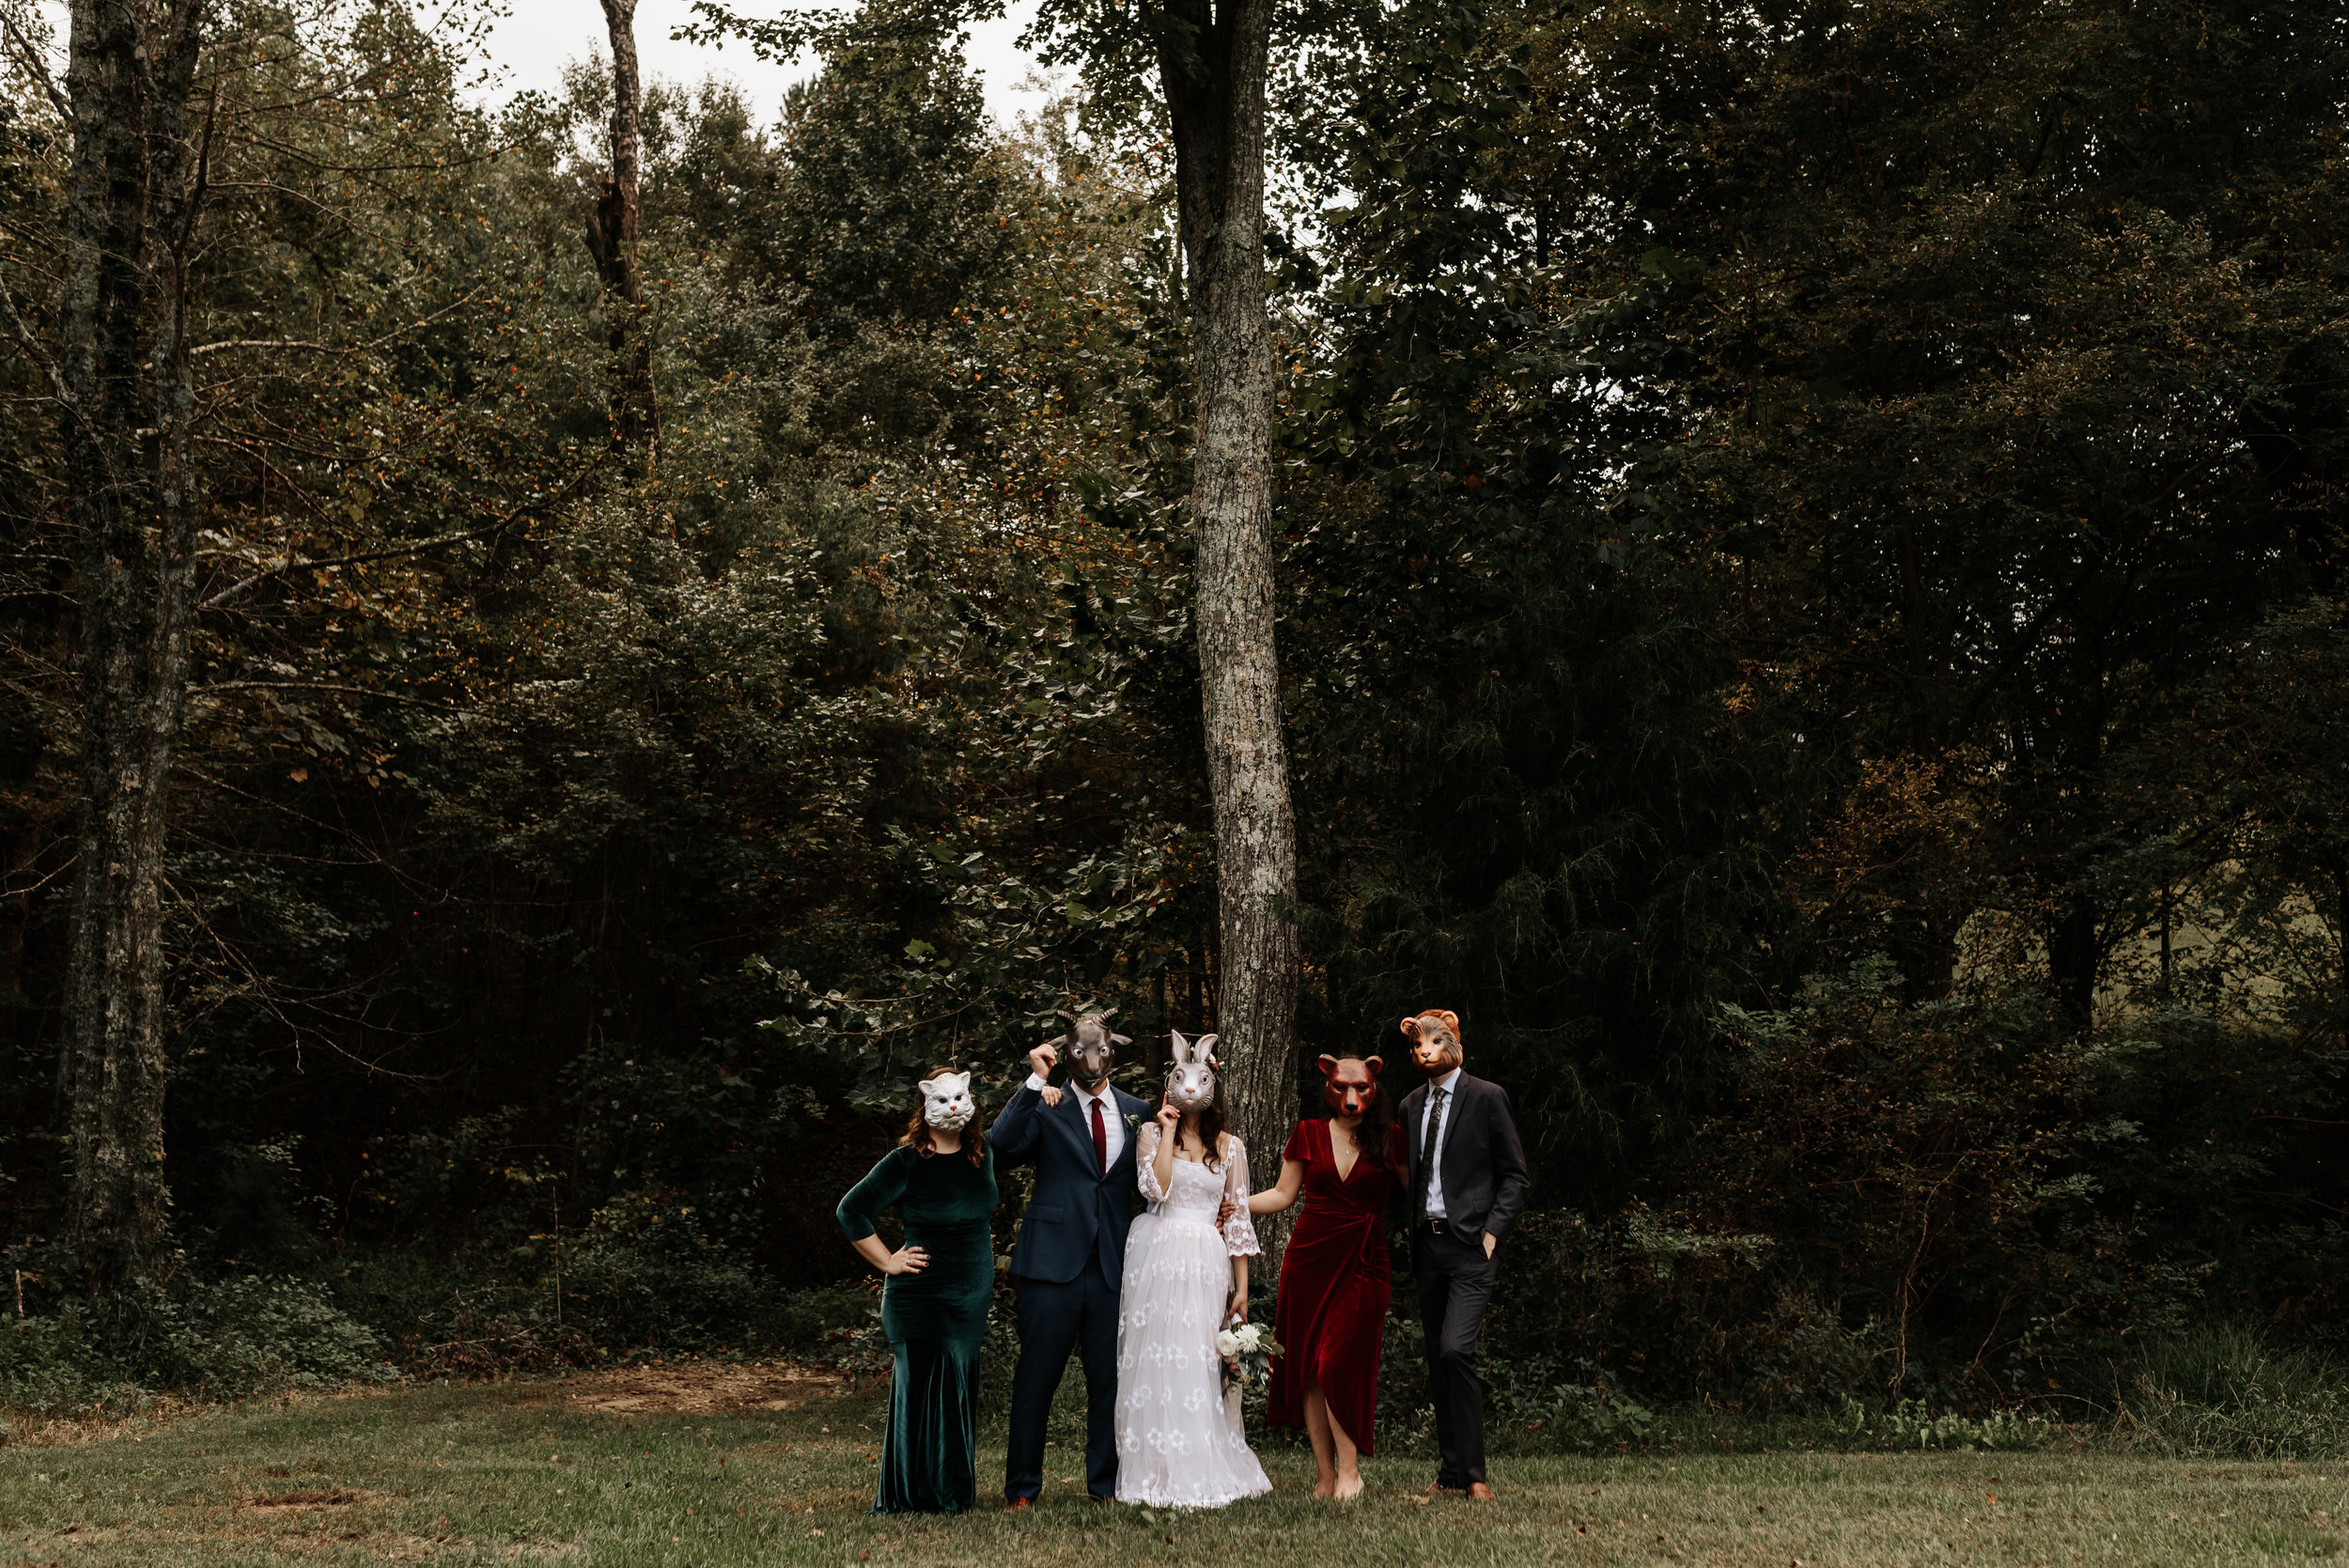 Veritas-Vineyards-and-Winery-Wedding-Photography-Afton-Virginia-Yasmin-Seth-Photography-by-V-9468.jpg